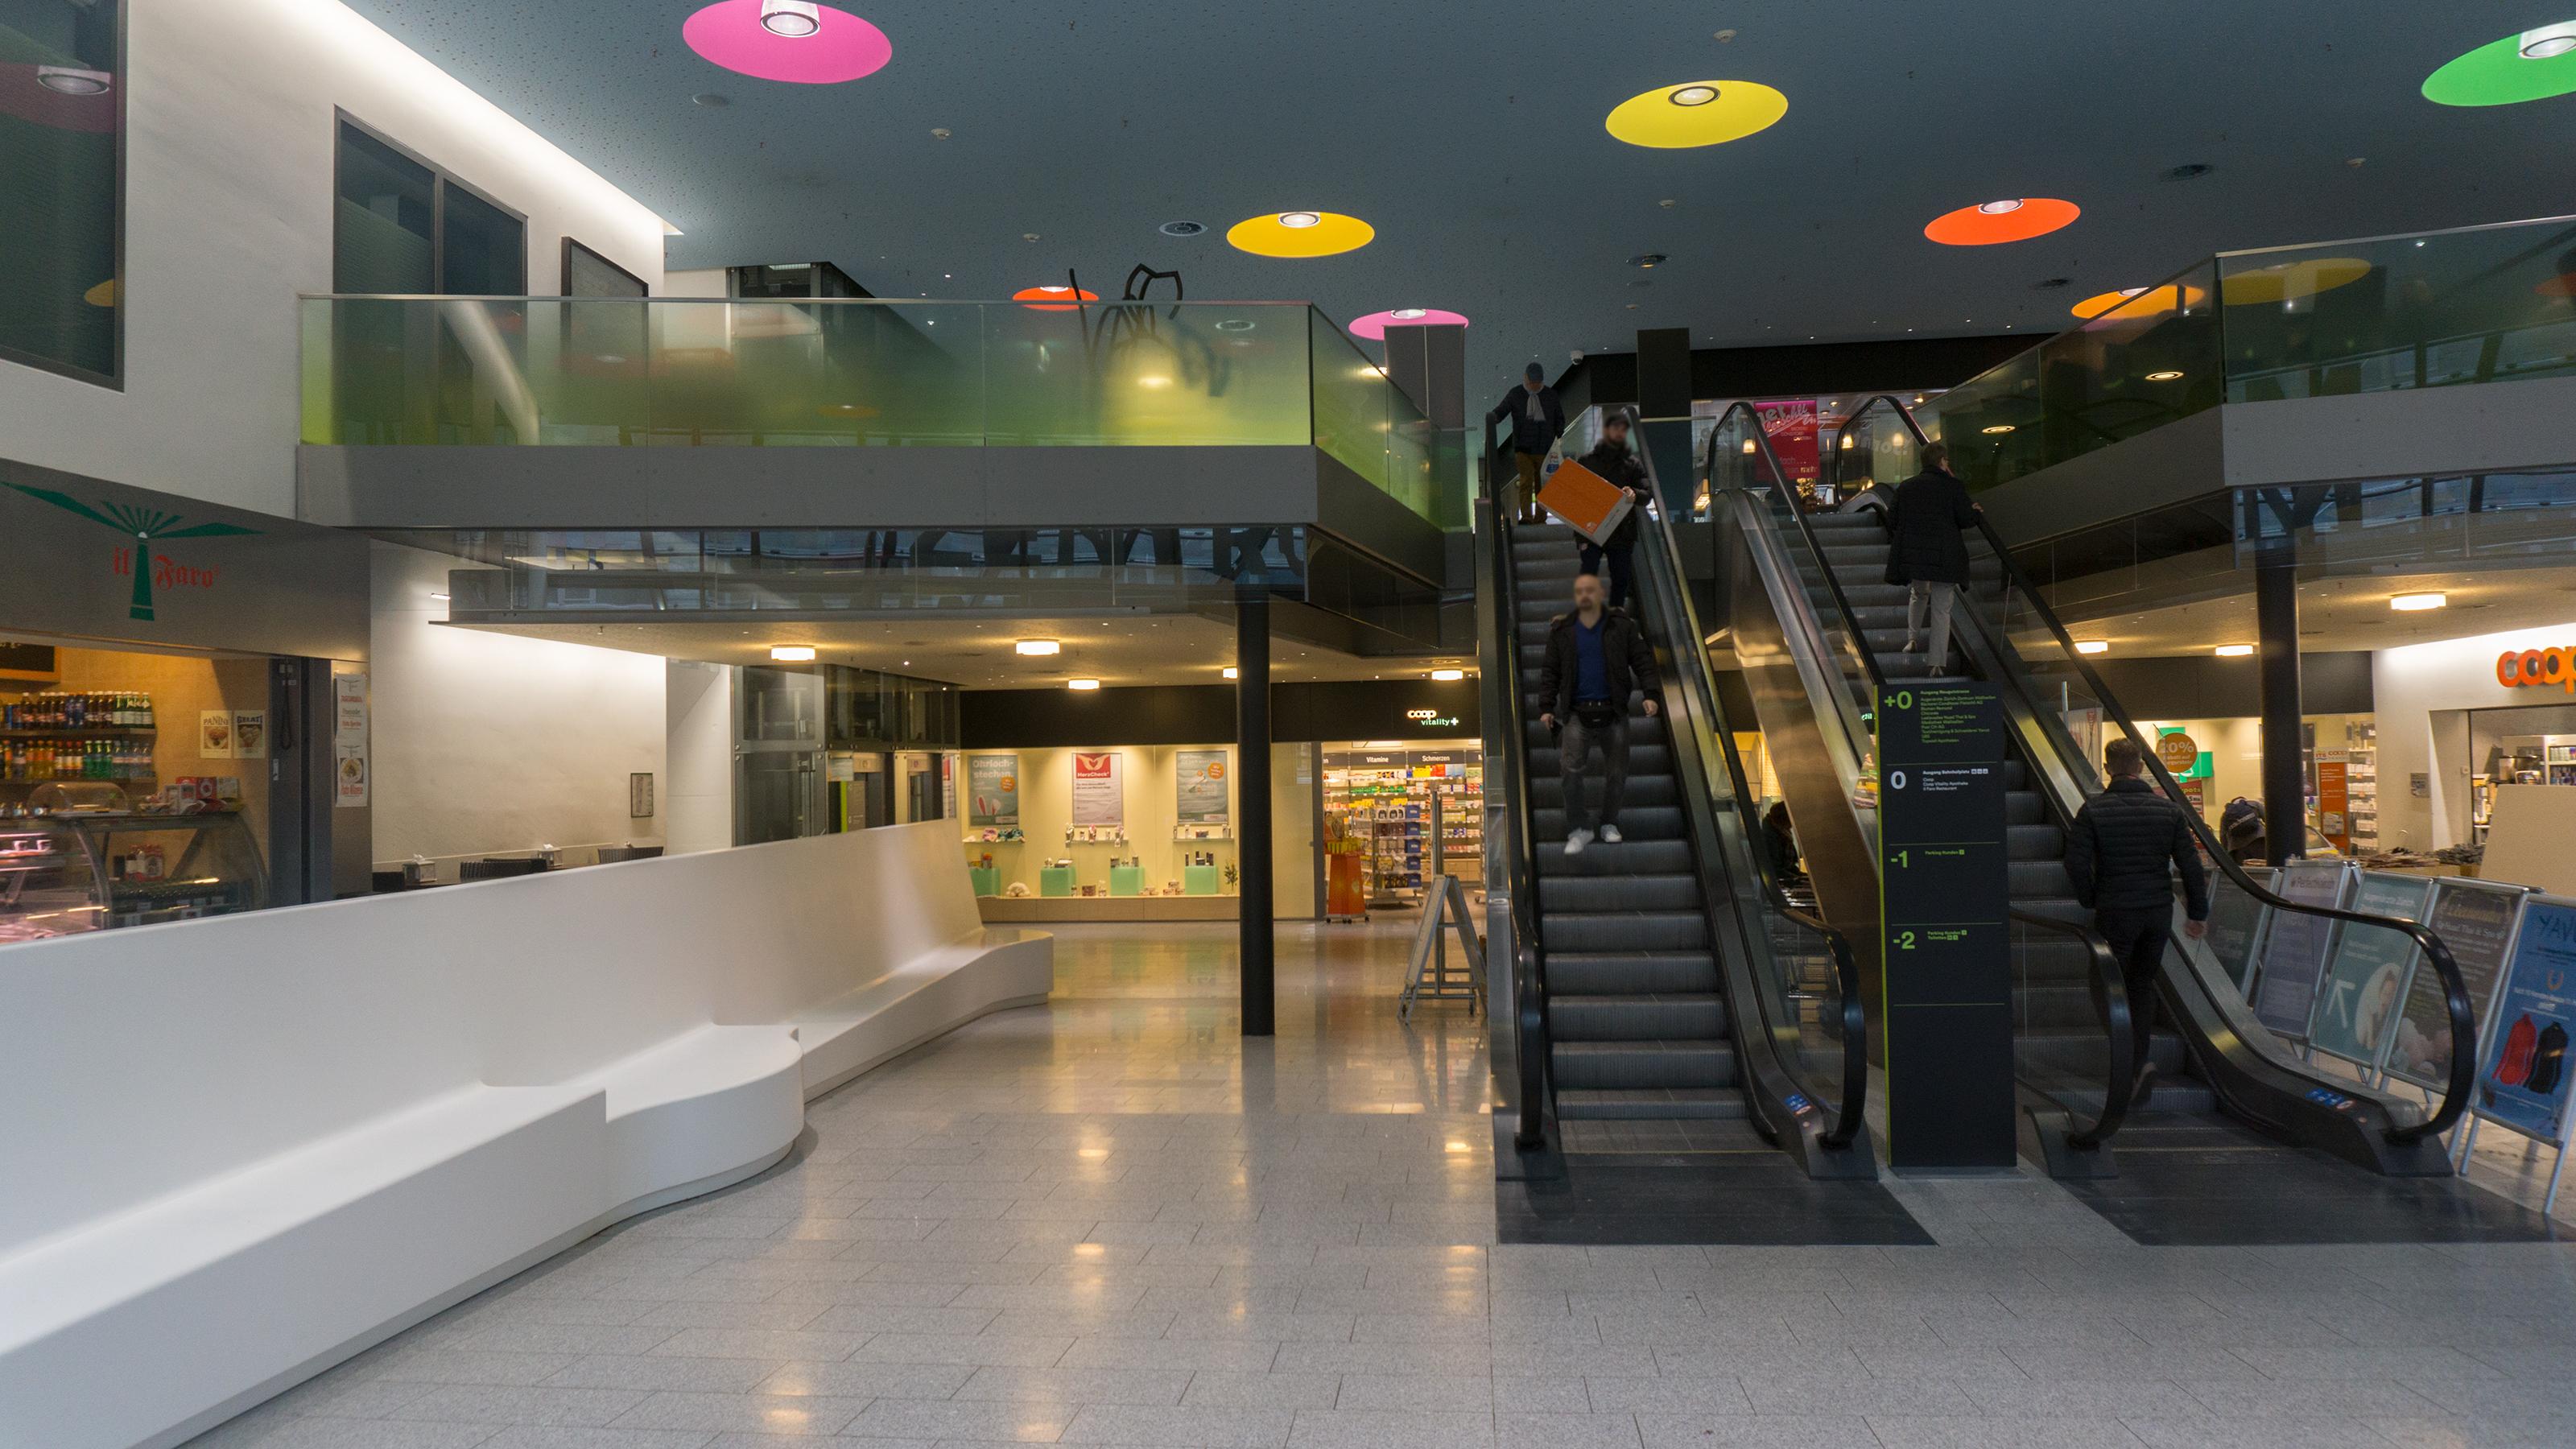 Zentrum Wallisellen - Logo LED Beschriftung Läden und Stele mit Stockwerkbeschriftung